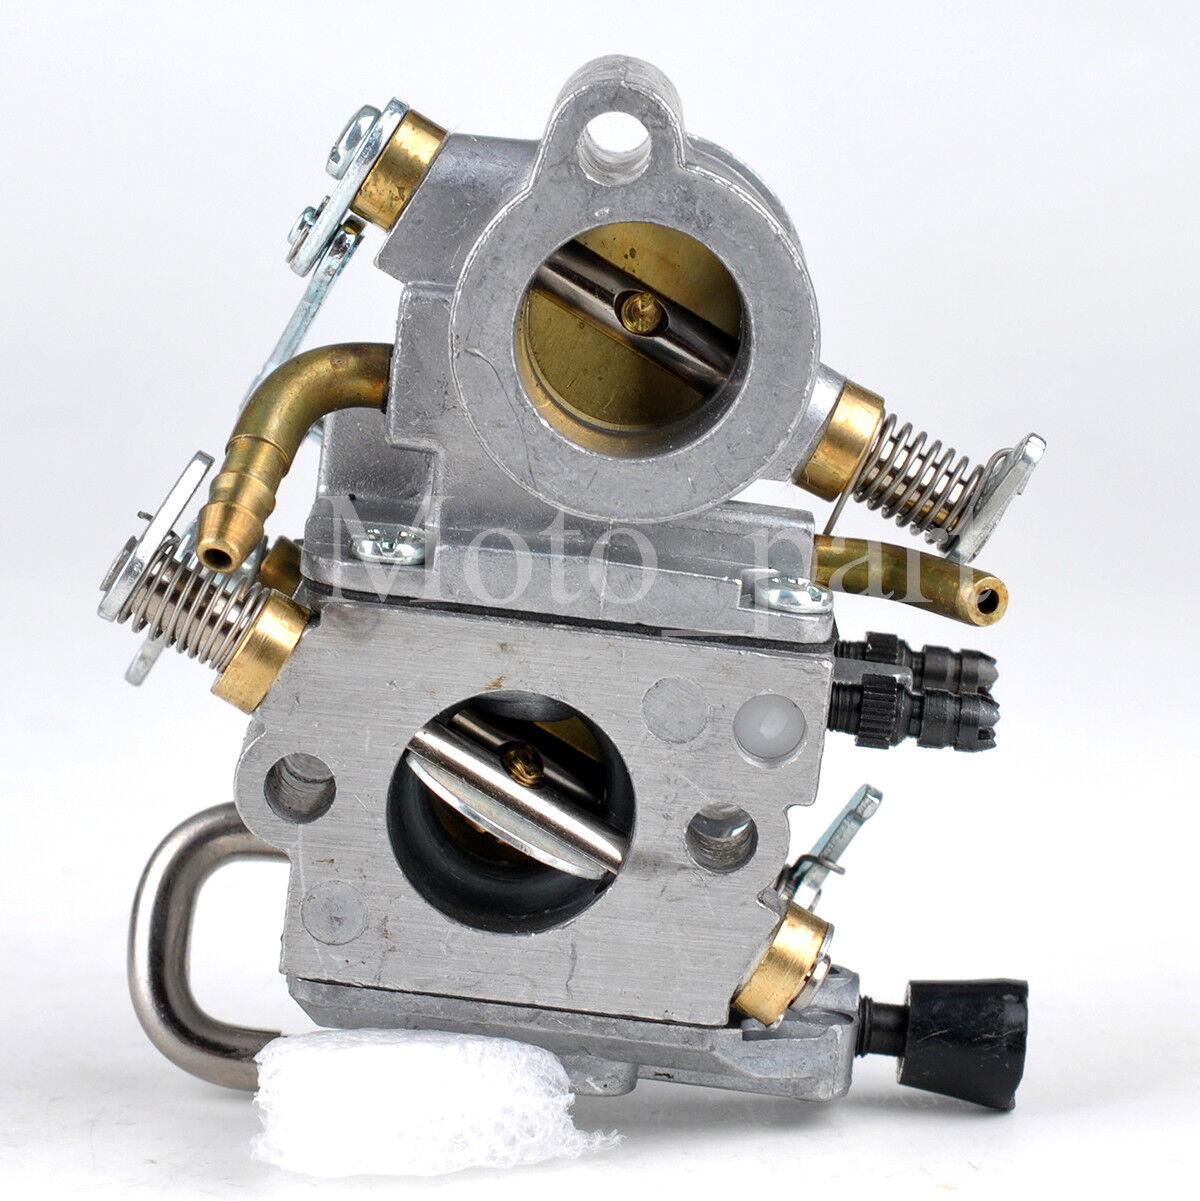 Carburetor Carby Fits Stihl TS410 TS420 Concrete Cut Off Saw OEM # 4238 120 0600